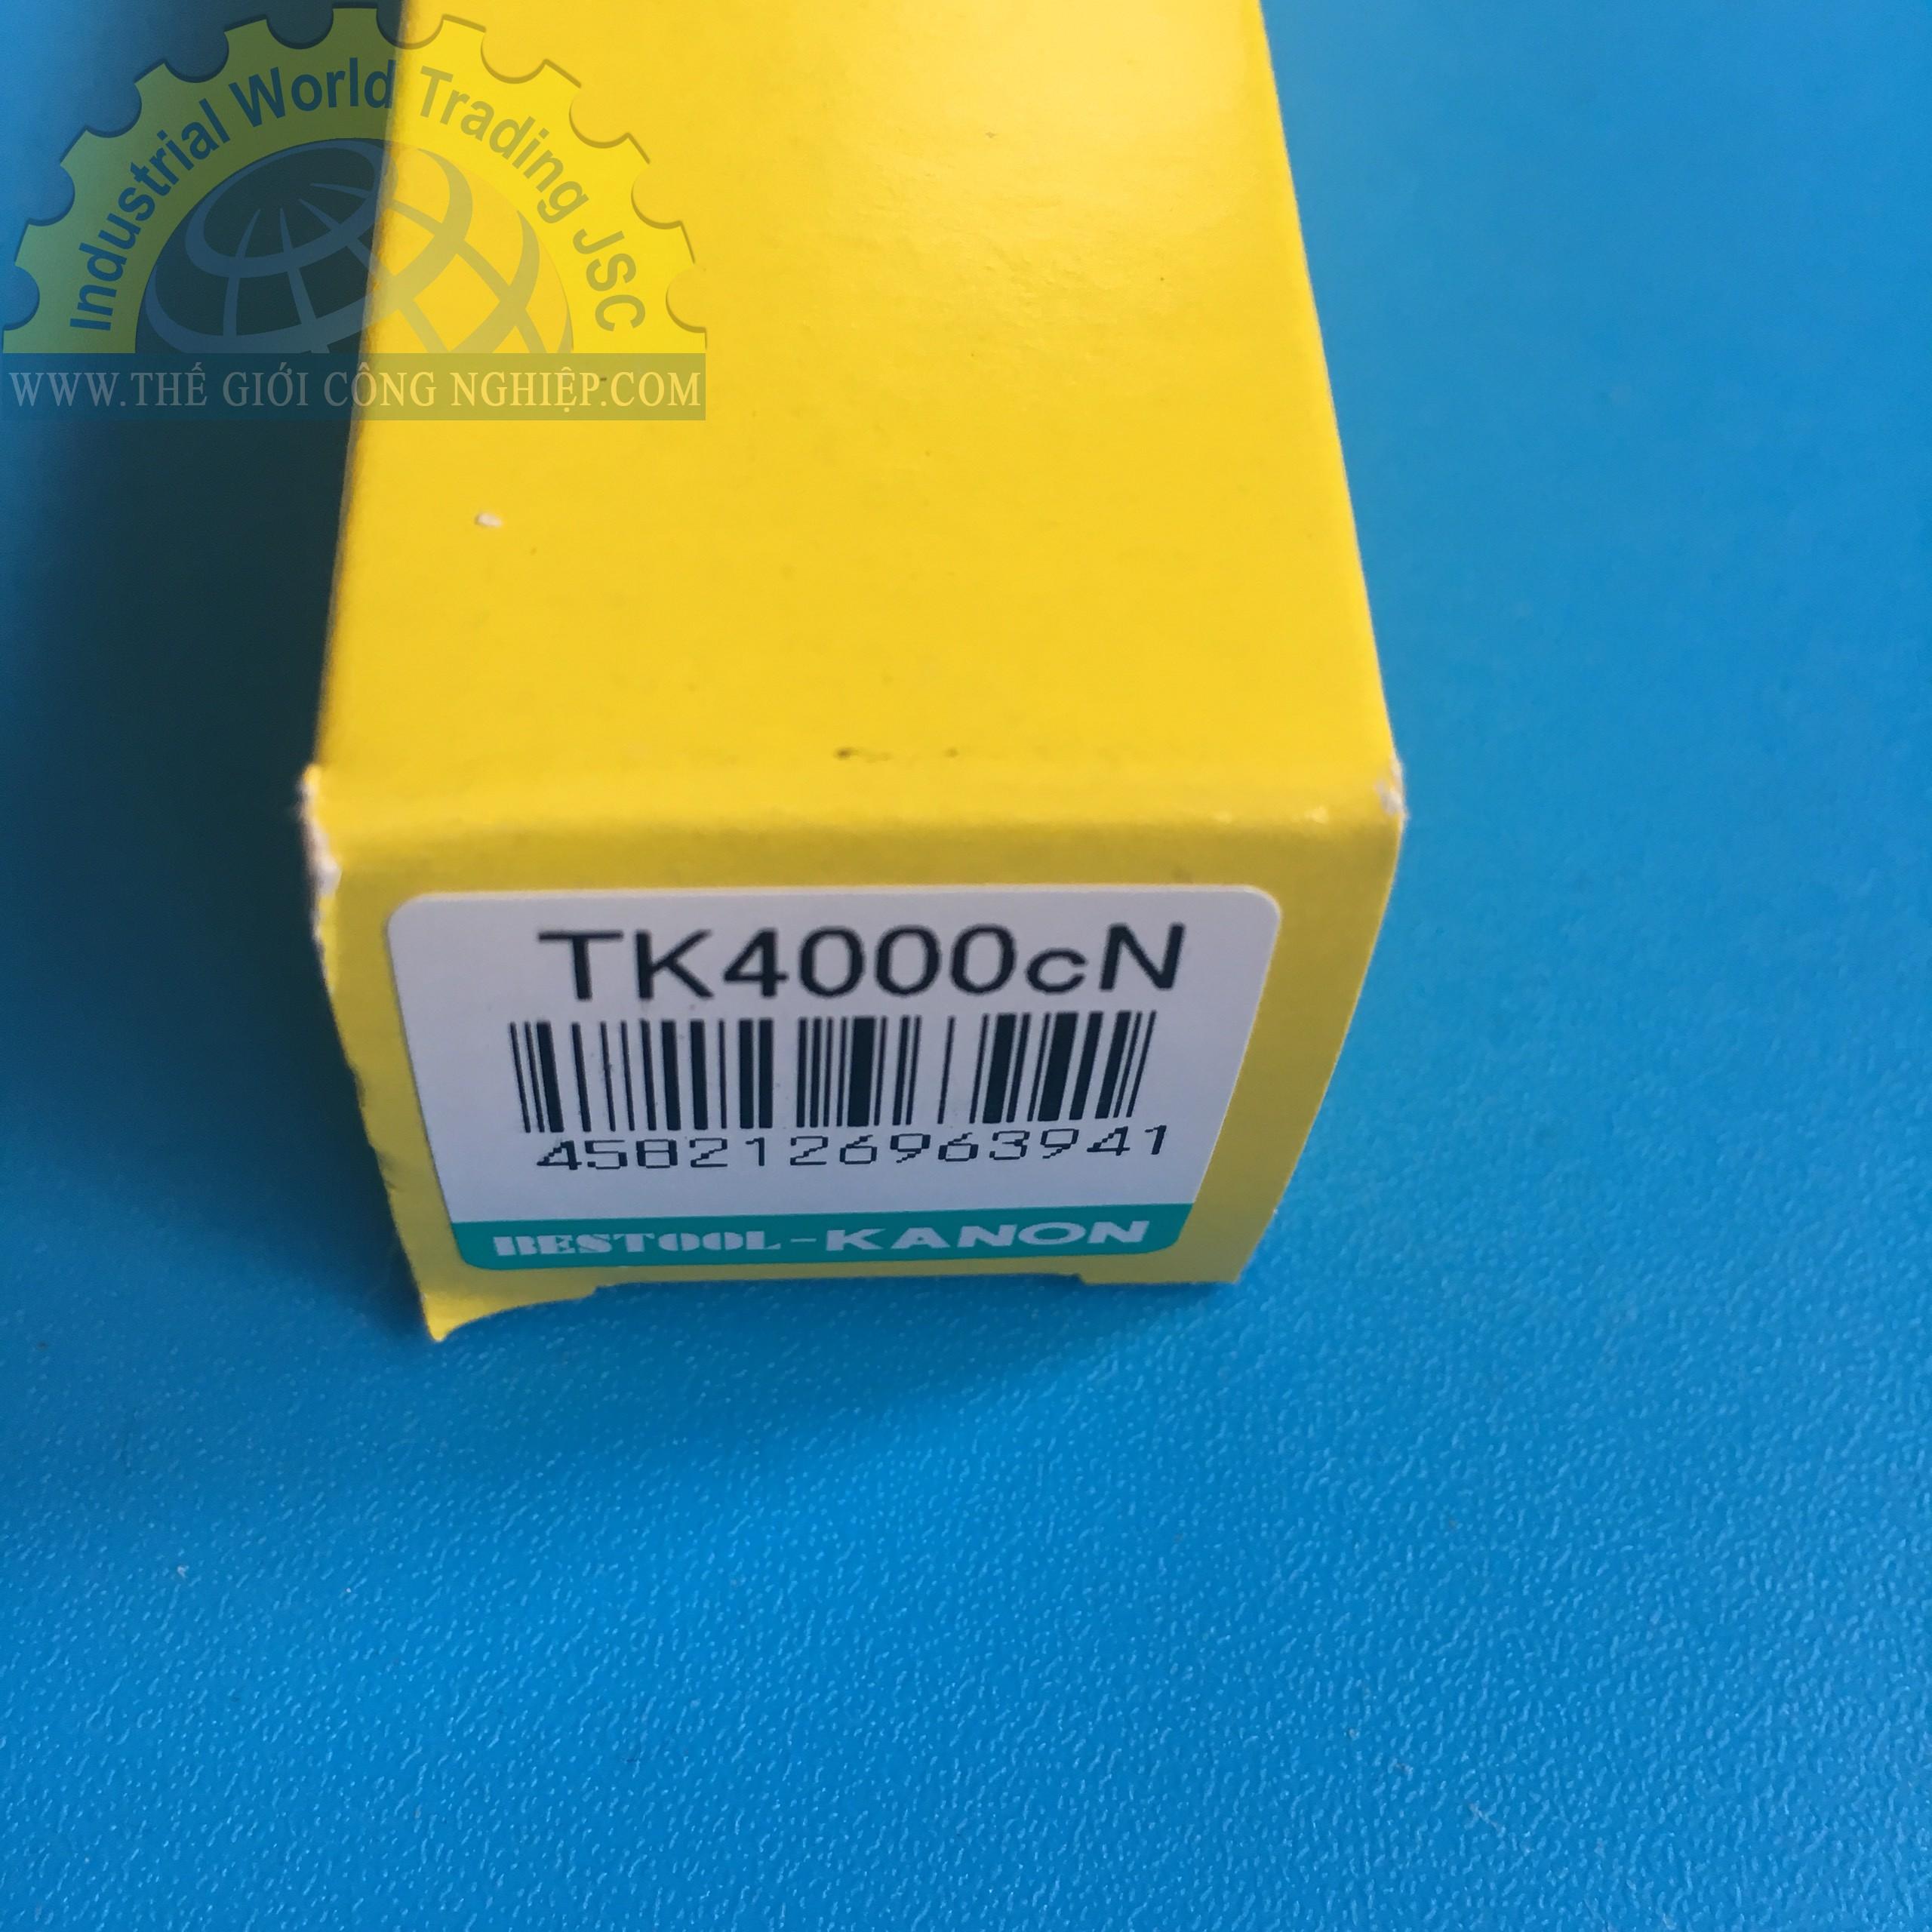 Cân lò xo 0 - 4000cN  TK4000CN Kanon